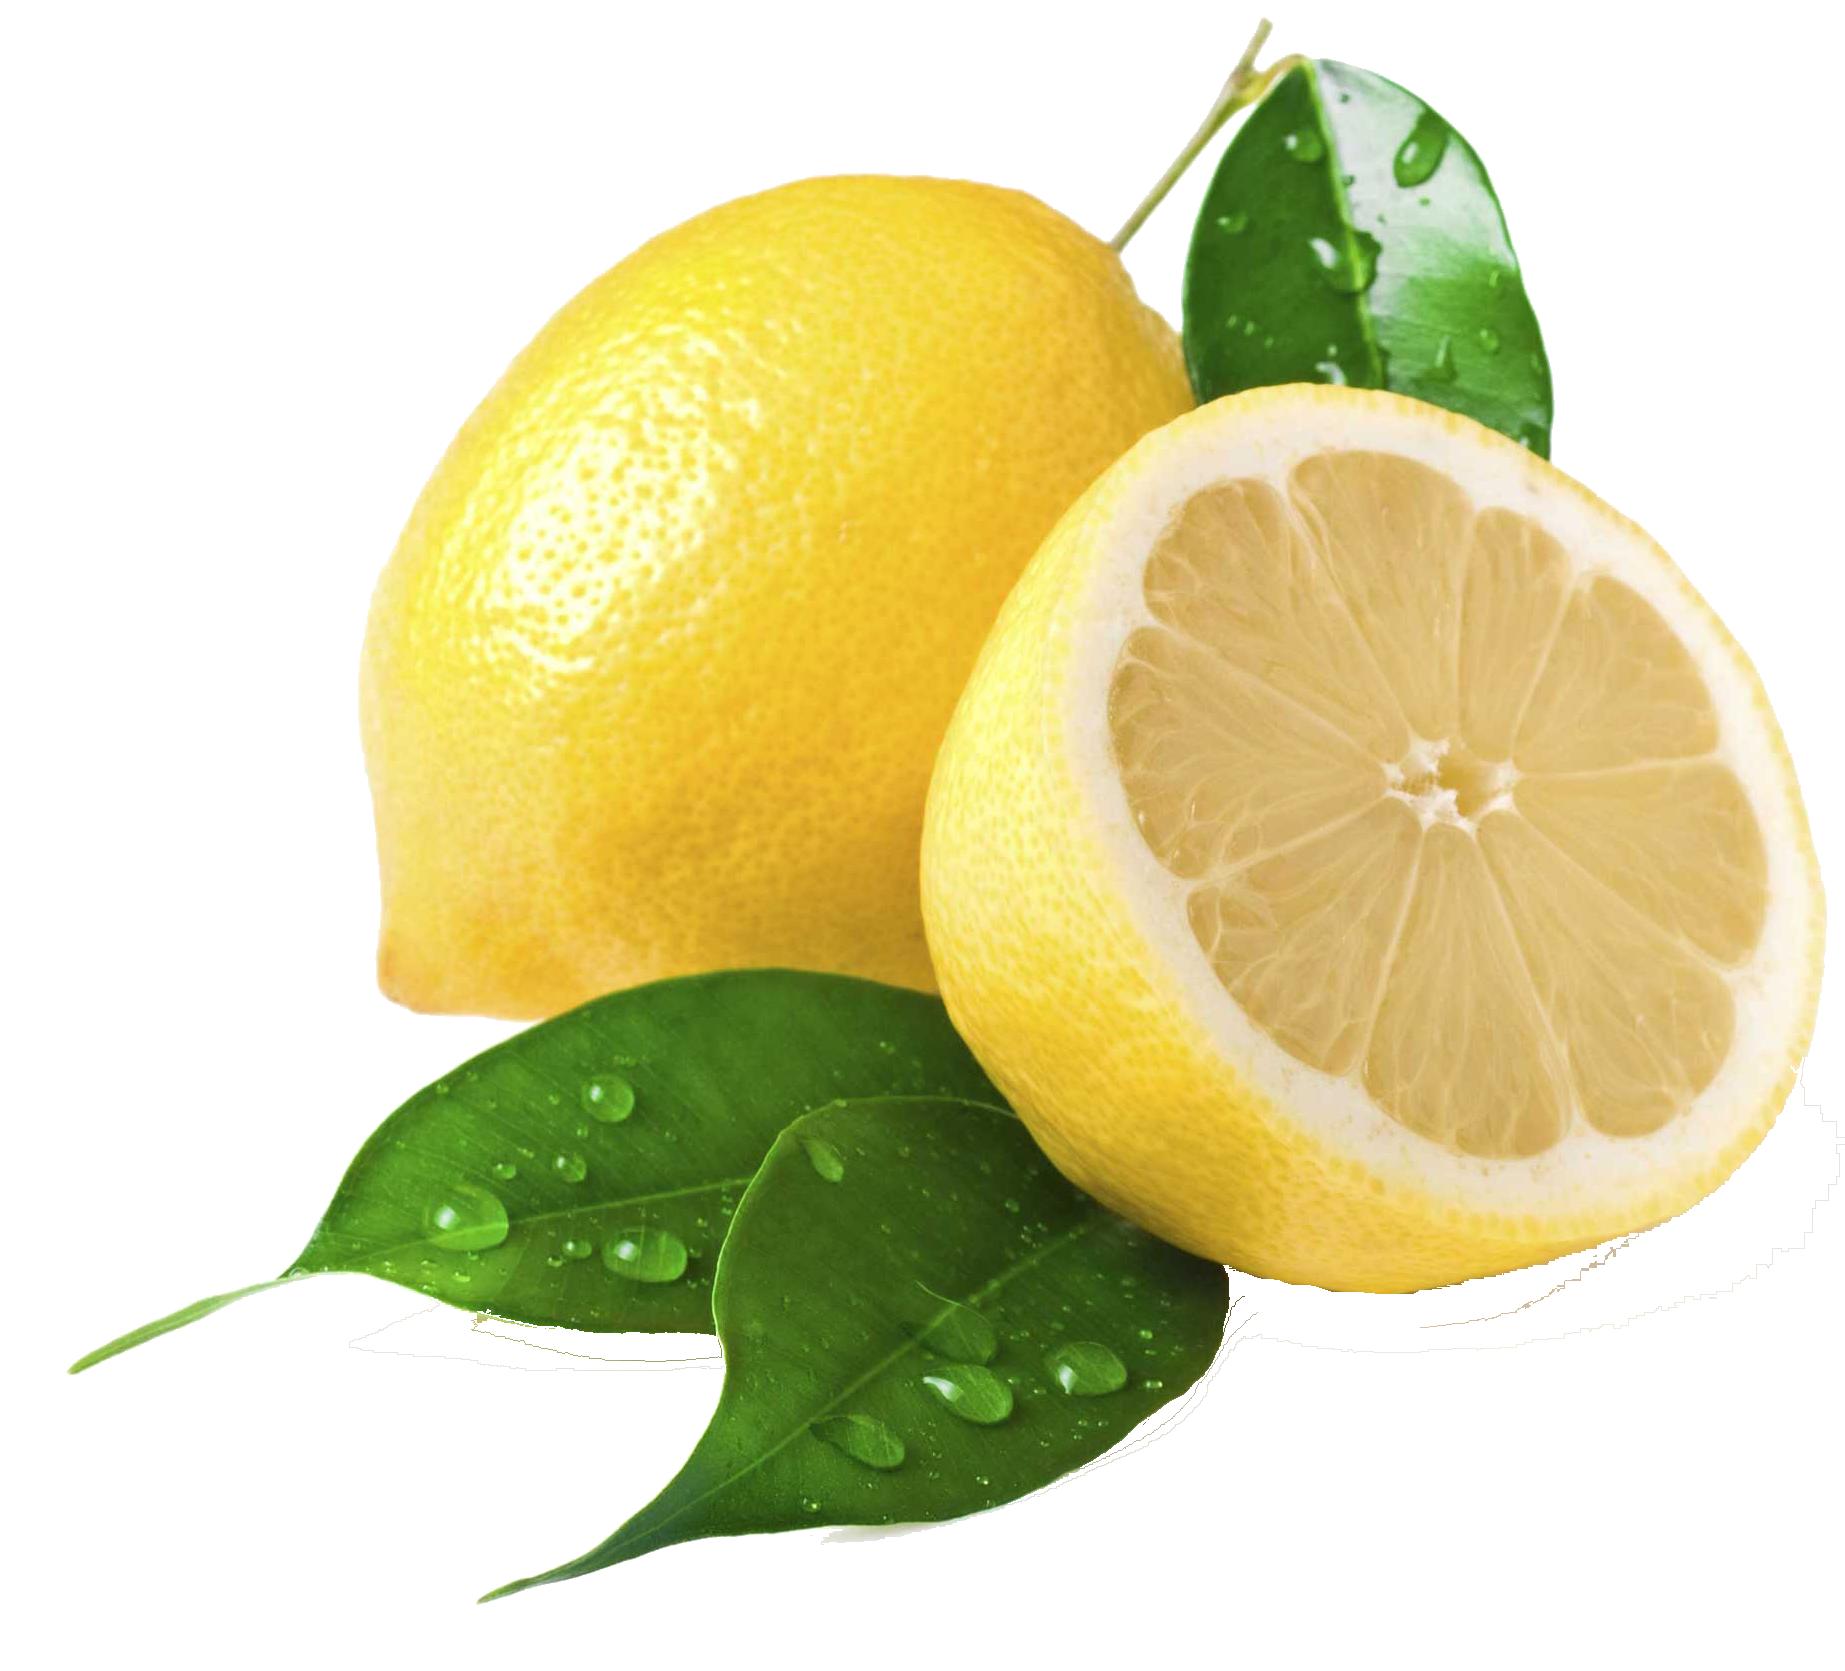 clip art freeuse library Lemons clipart lemon fruit. Png image purepng free.